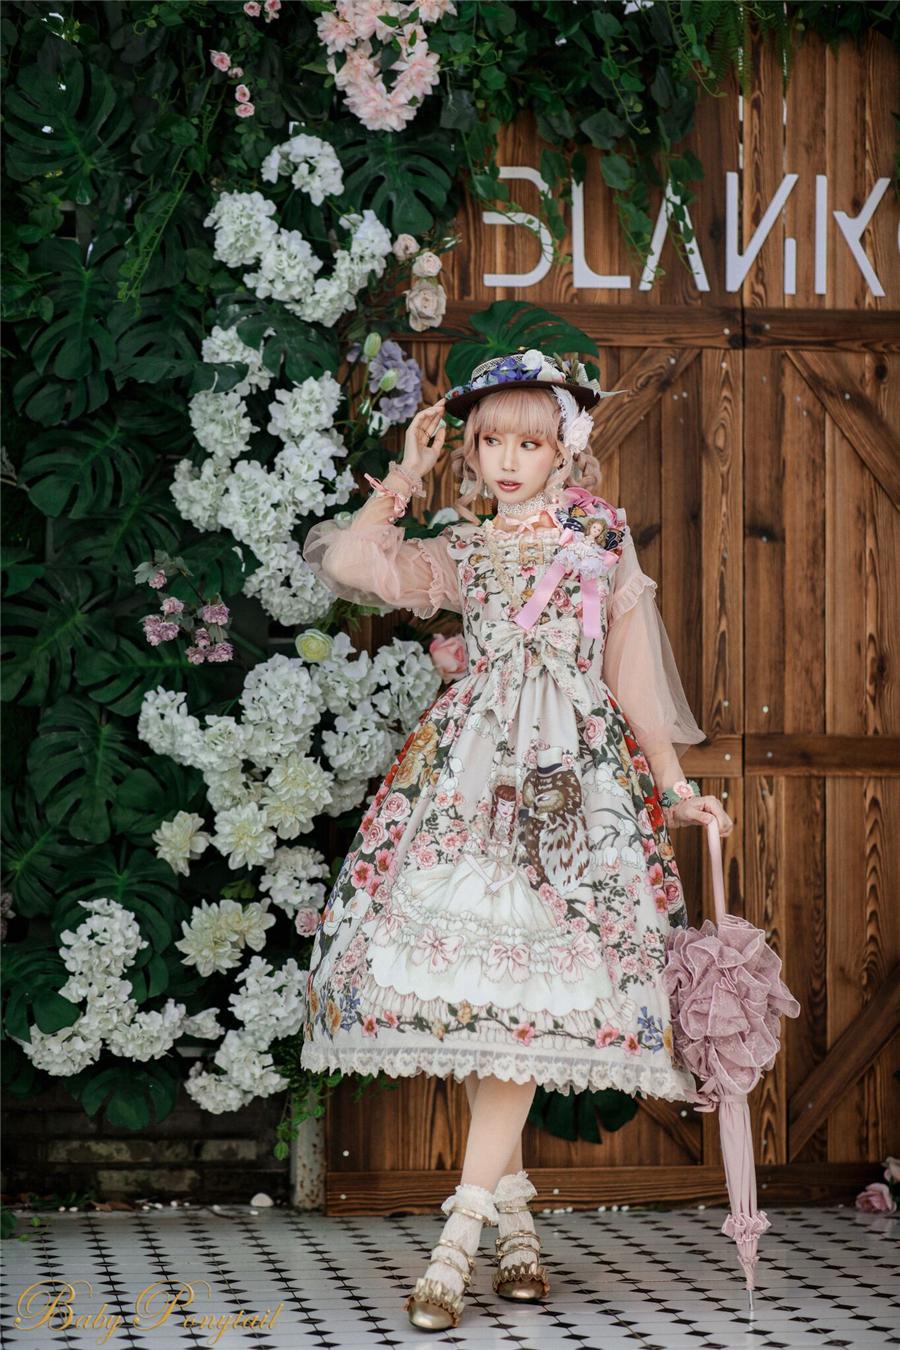 Polly's Garden of Dreams_Model Photo_Ivory JSK_Kaka_04.jpg